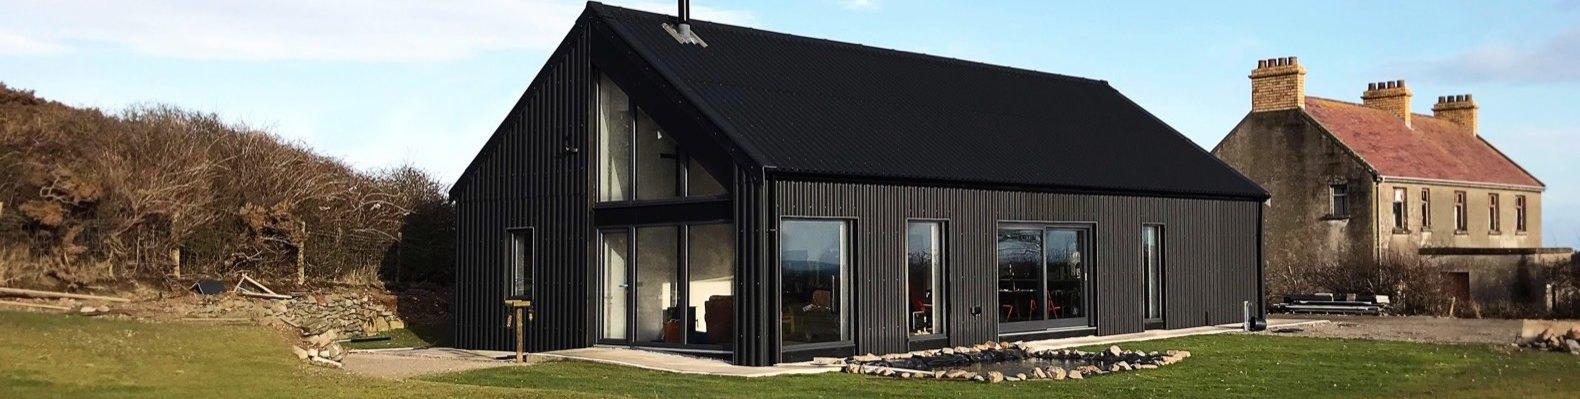 inhabitat gallerymetal clad eco cottage puts a modern spin on irish rural architecture